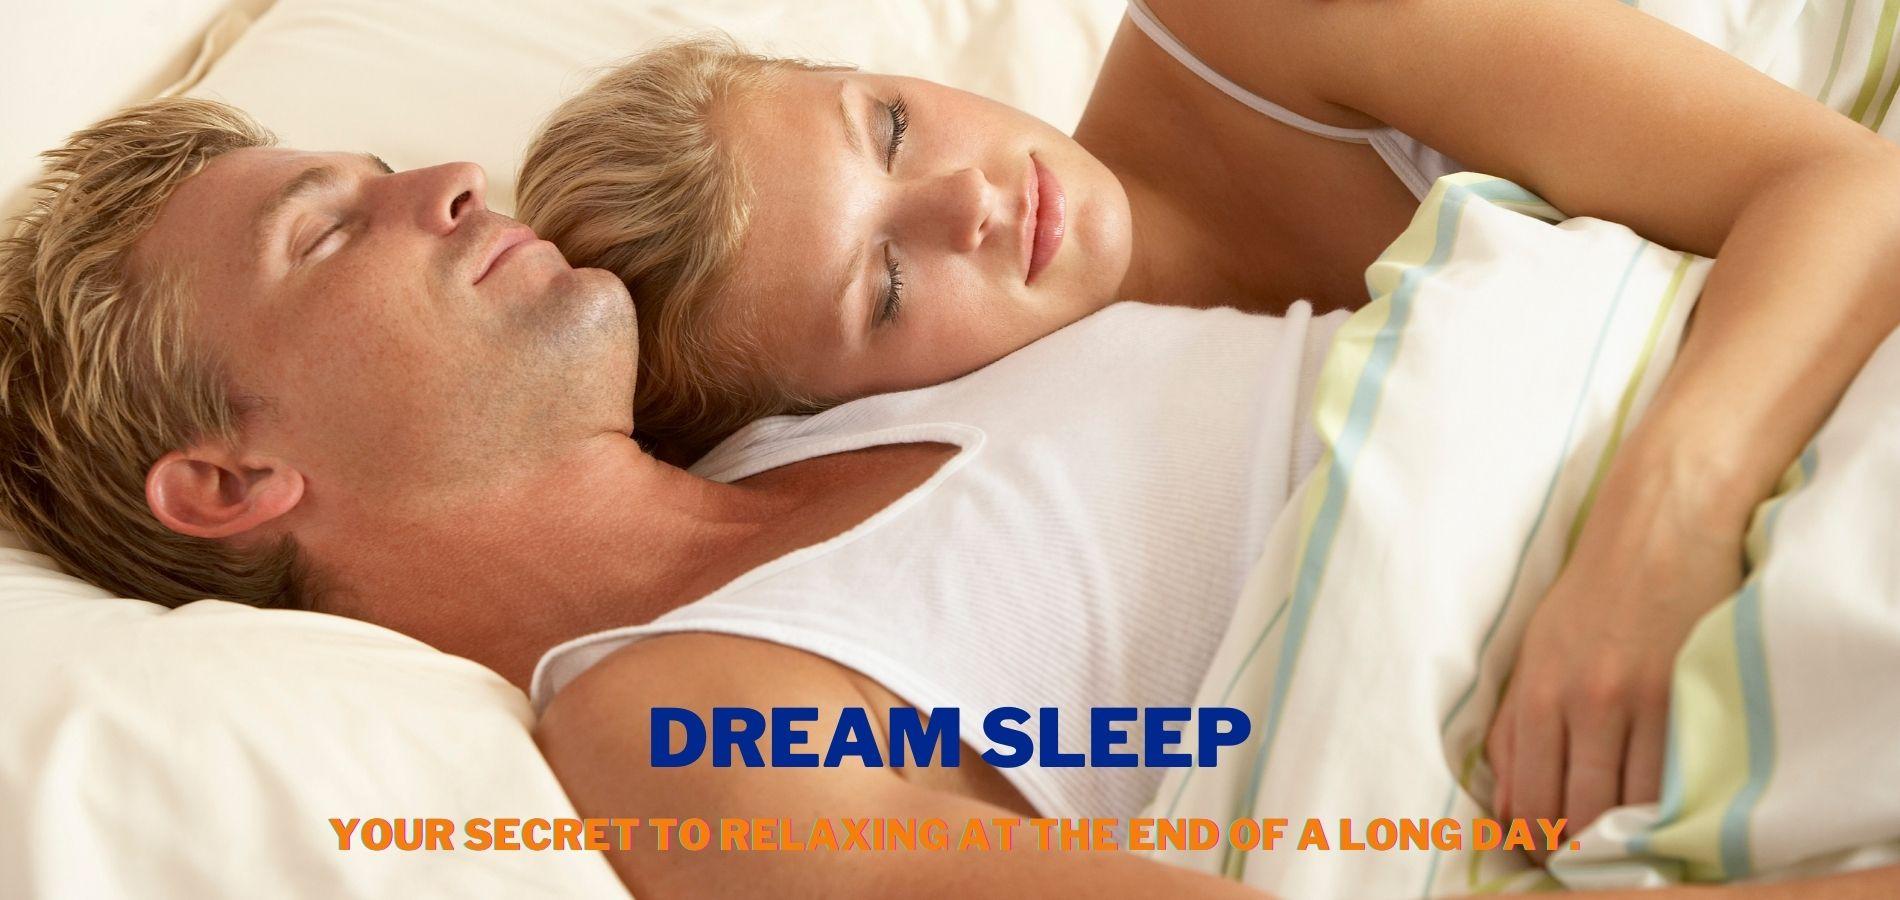 zensleep-dreamsleep-bedsheet